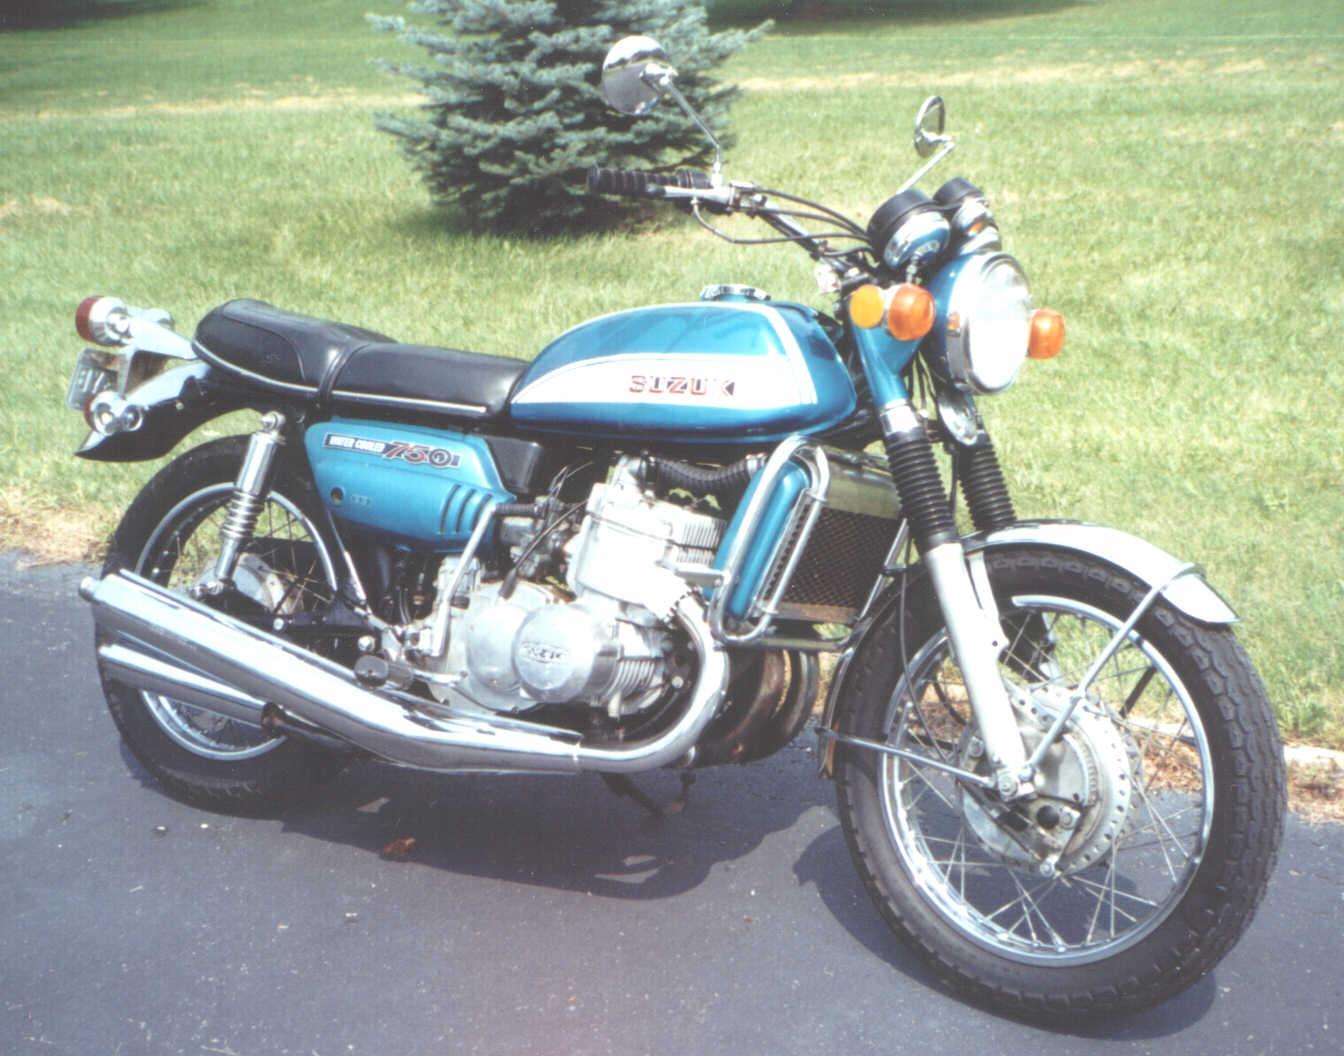 Vintage Suzuki Motorcycle 8